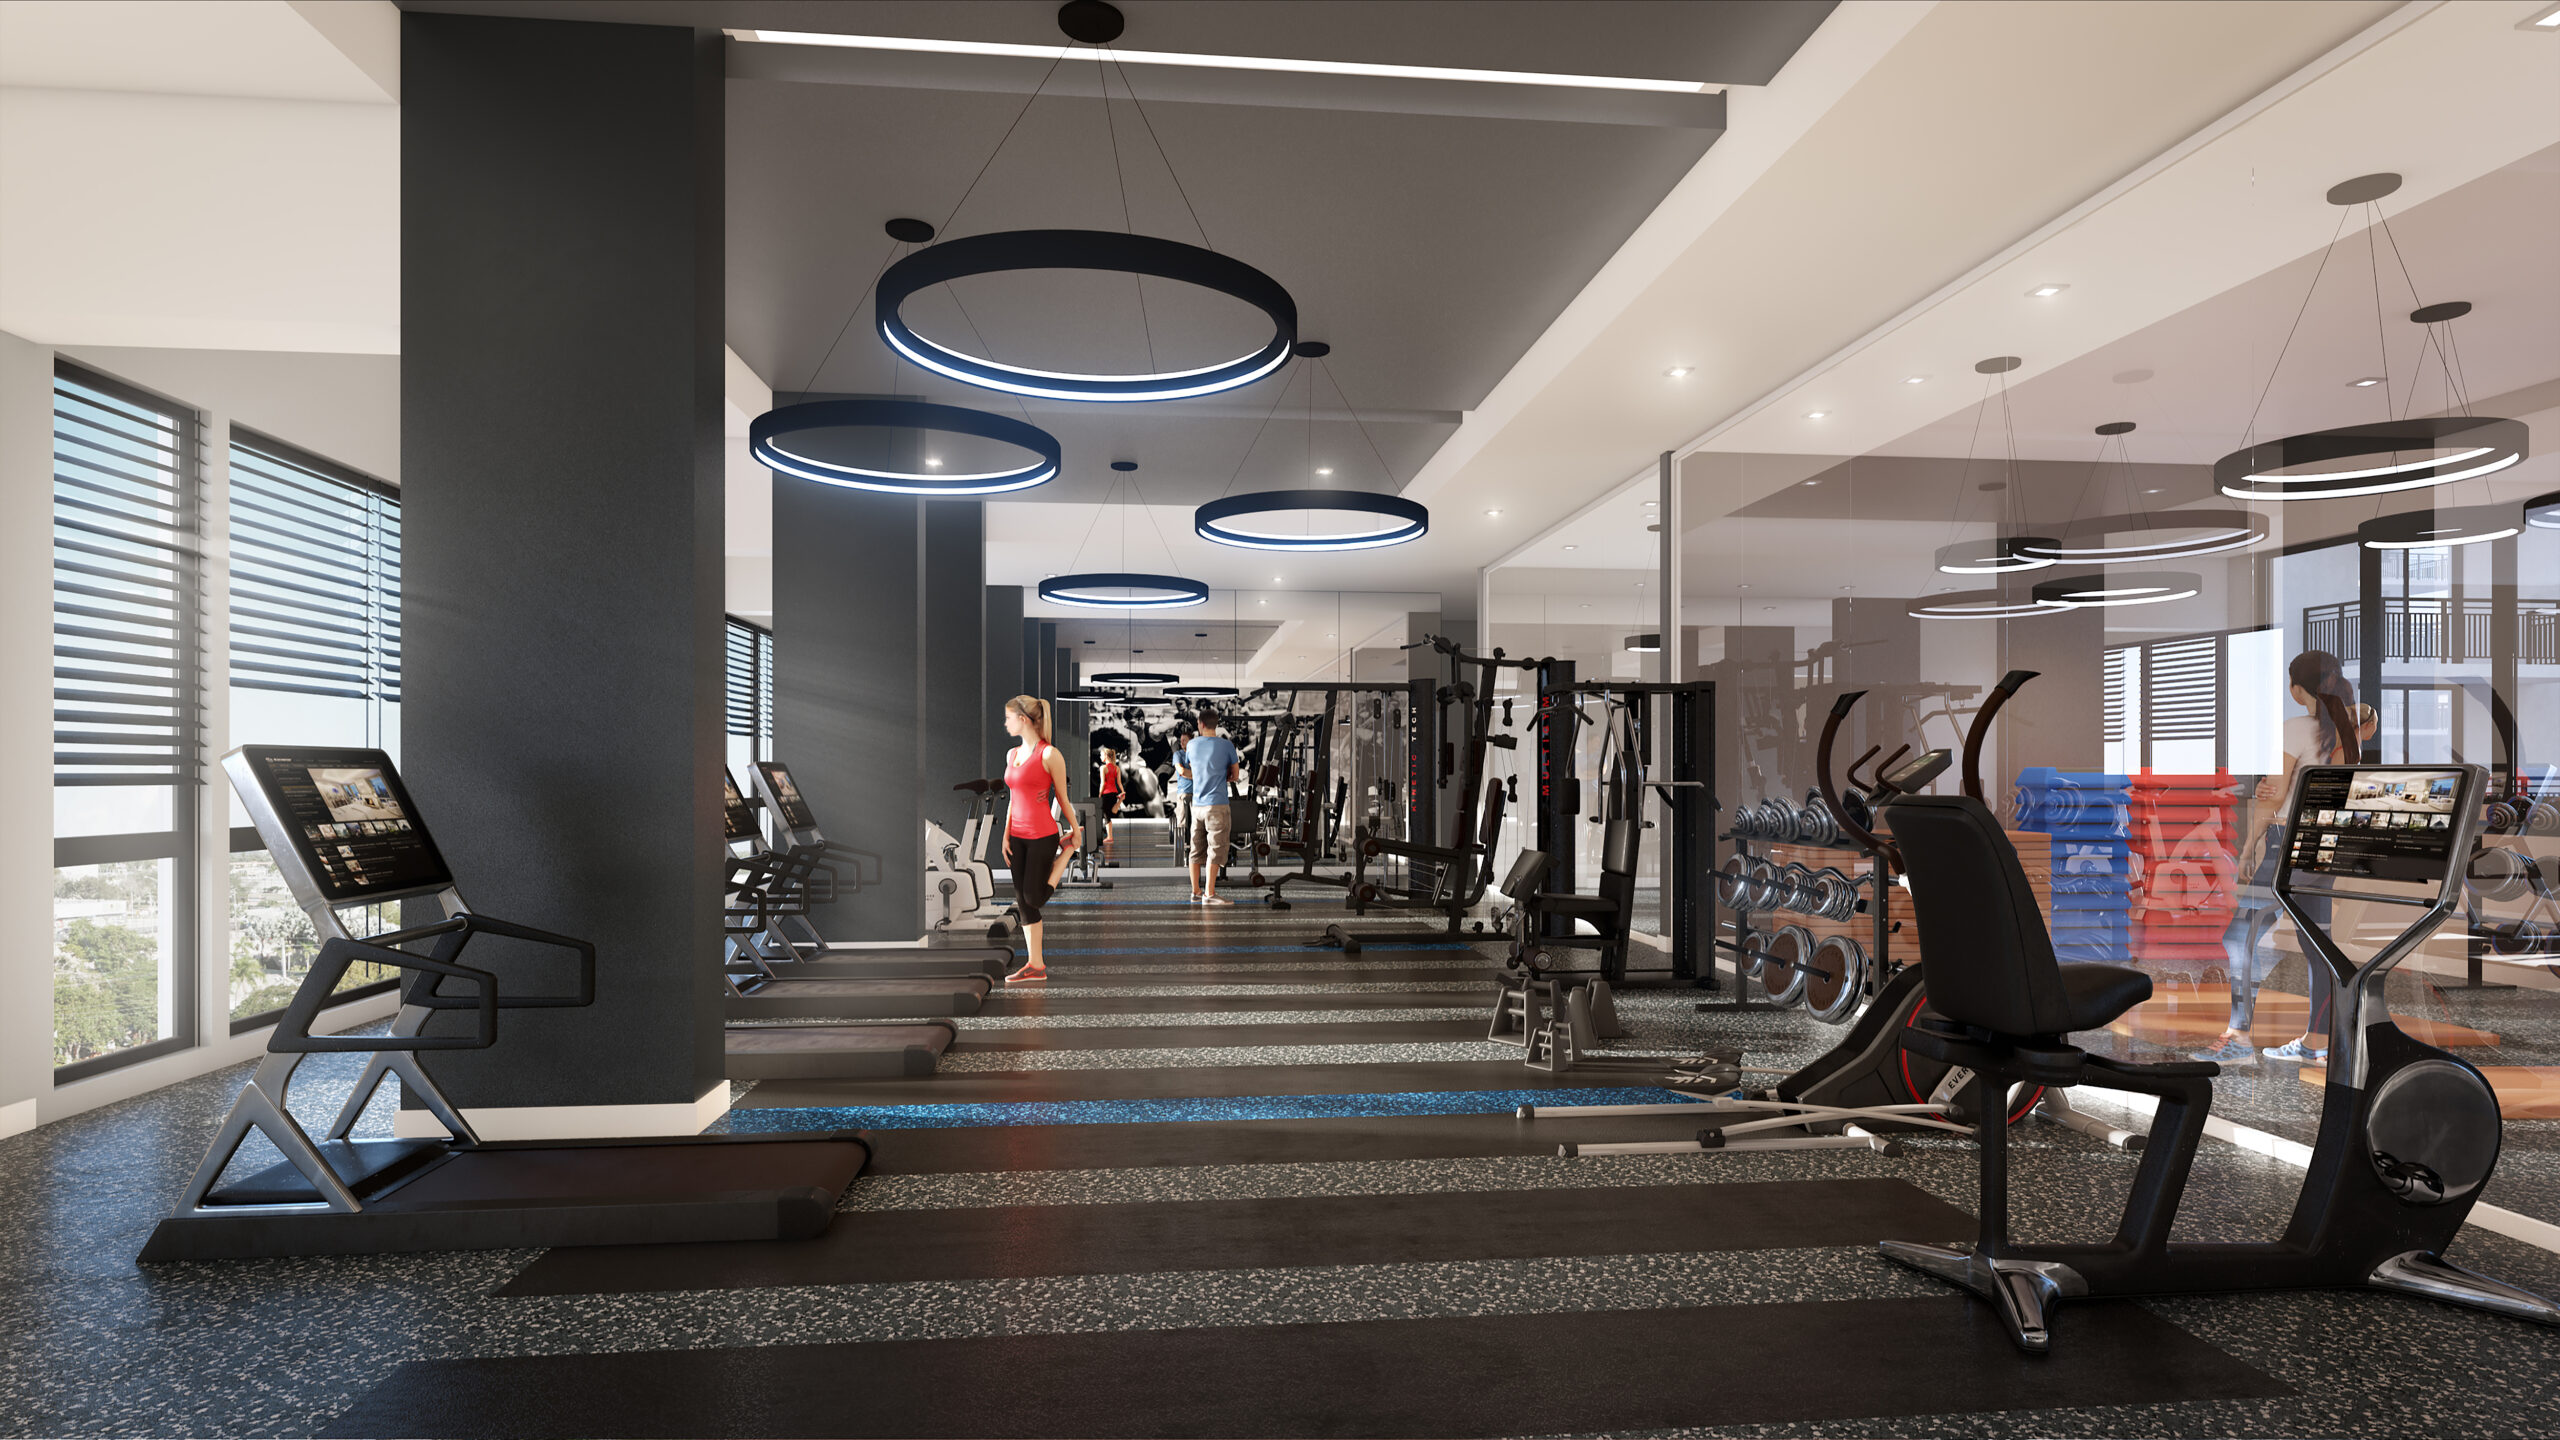 Eon_Cam03_Fitness_Center_03-29-19